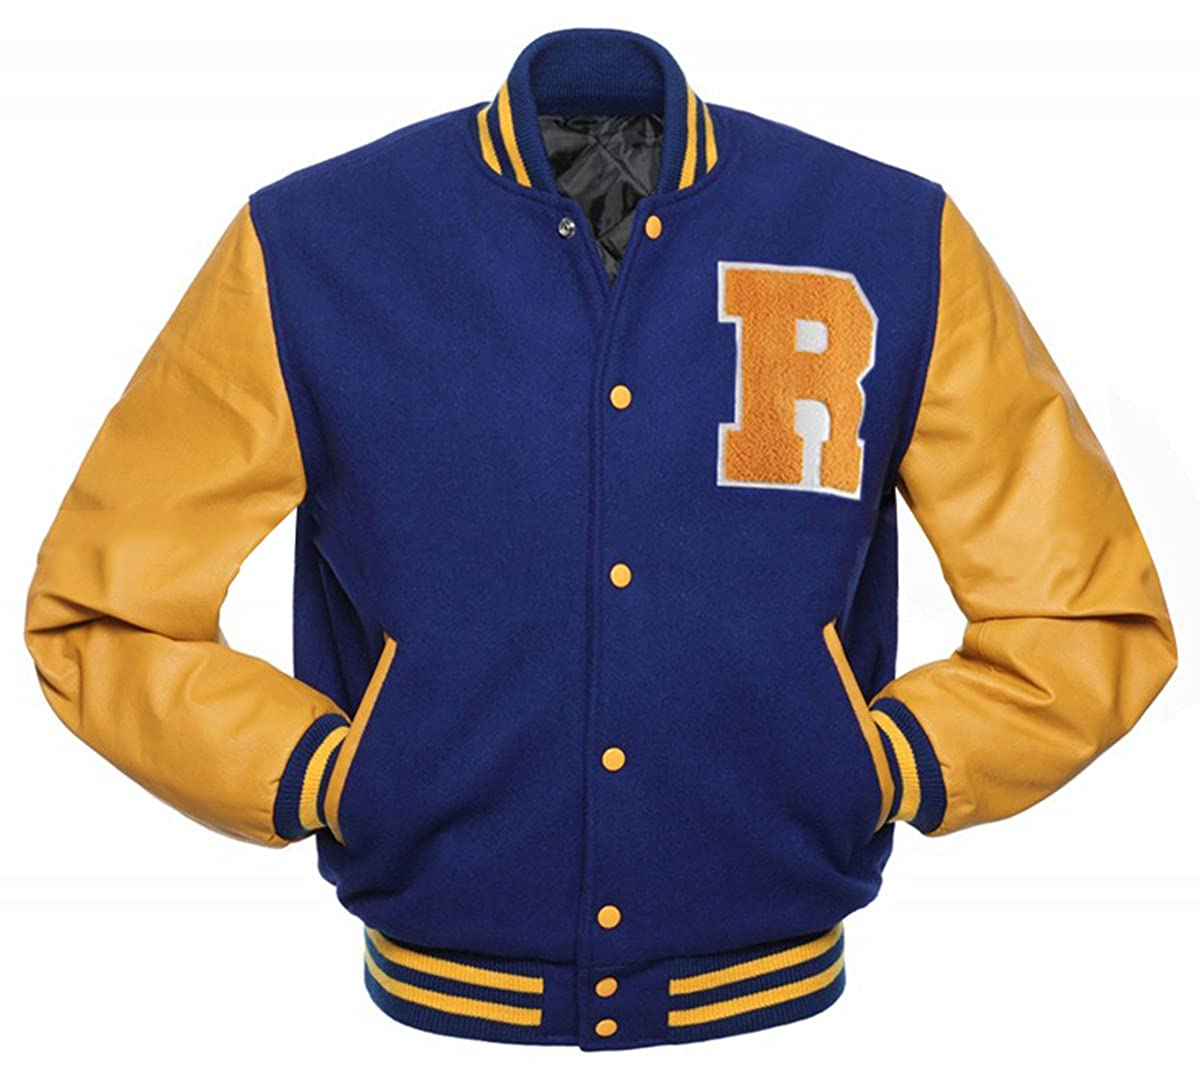 Fashion/_First Riverdale Archie Andrews KJ APA Varsity Letterman R Bomber Leather Jacket